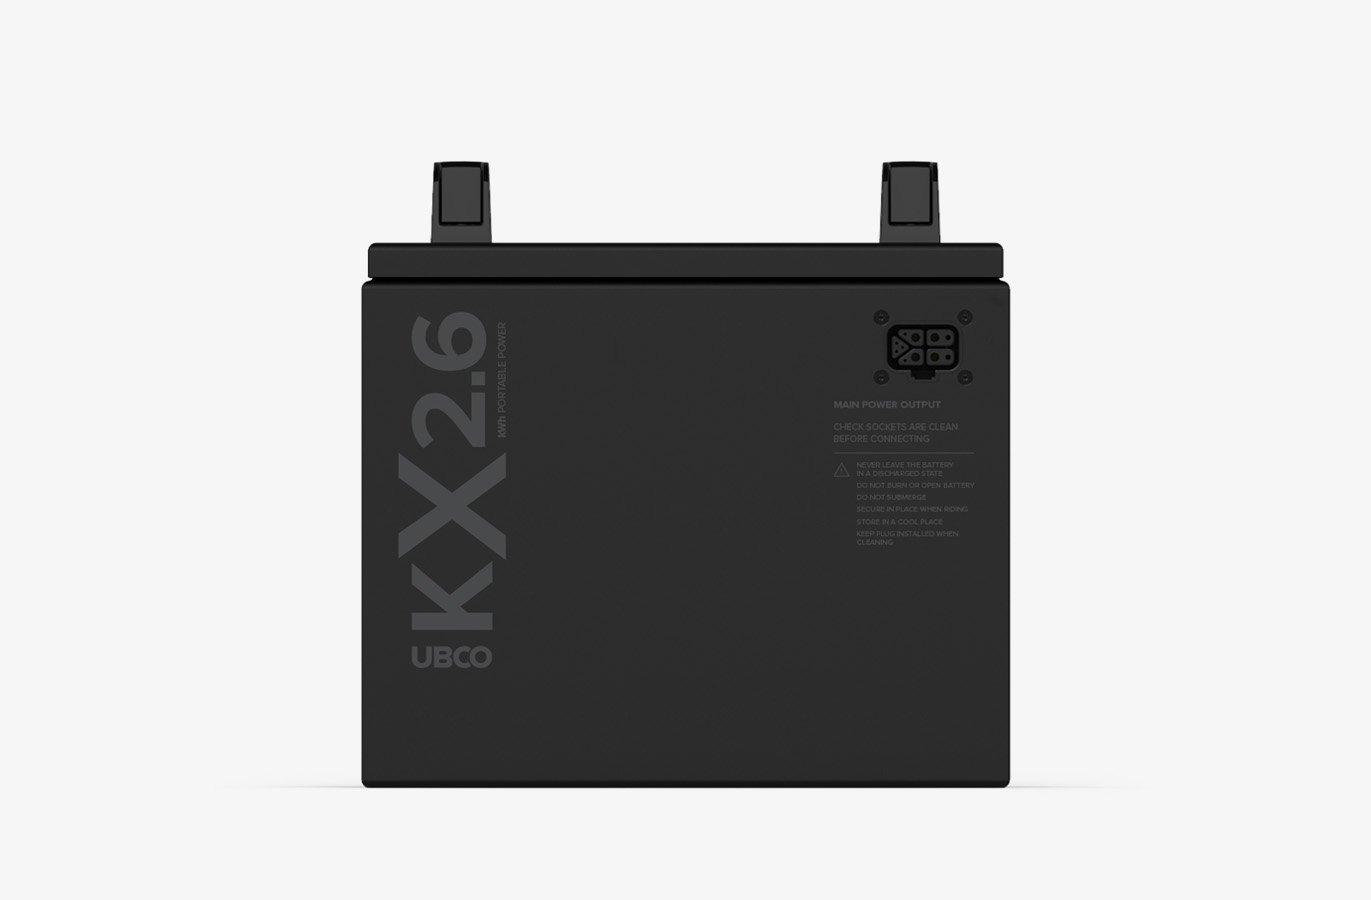 KX2.6 POWER SUPPLY